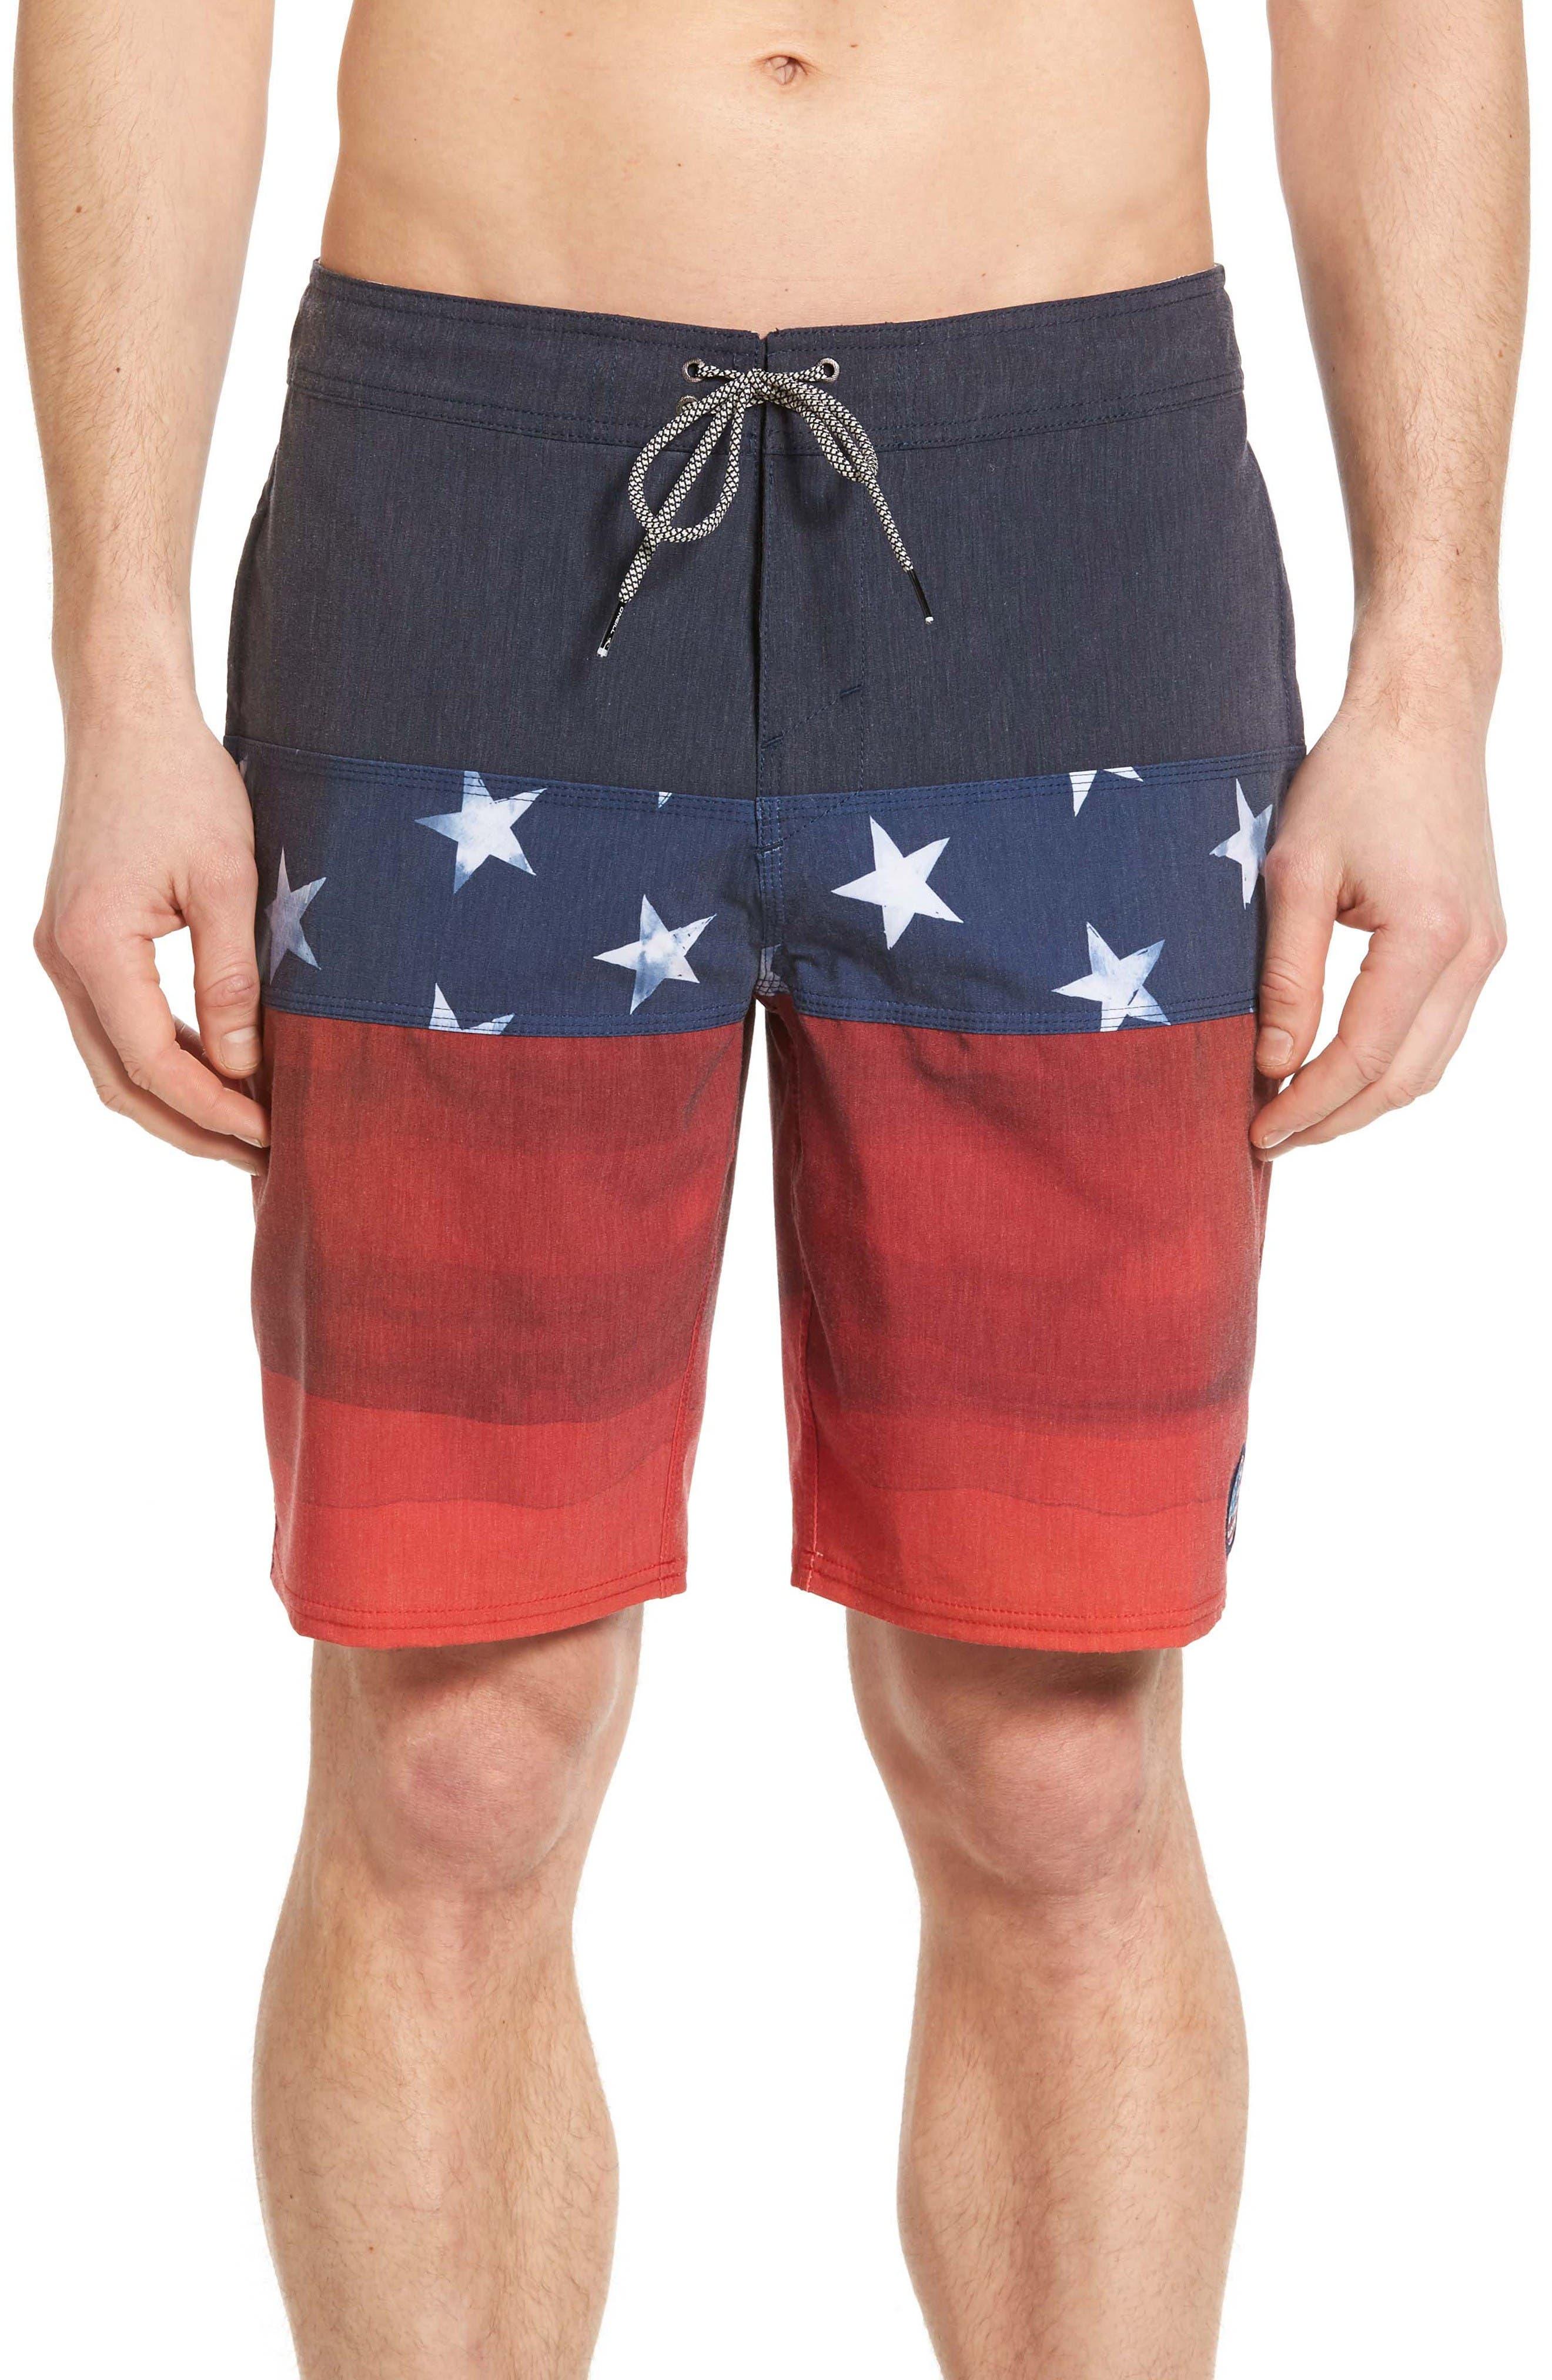 O'Neill Hyperfreak Liberty 24-7 Board Shorts